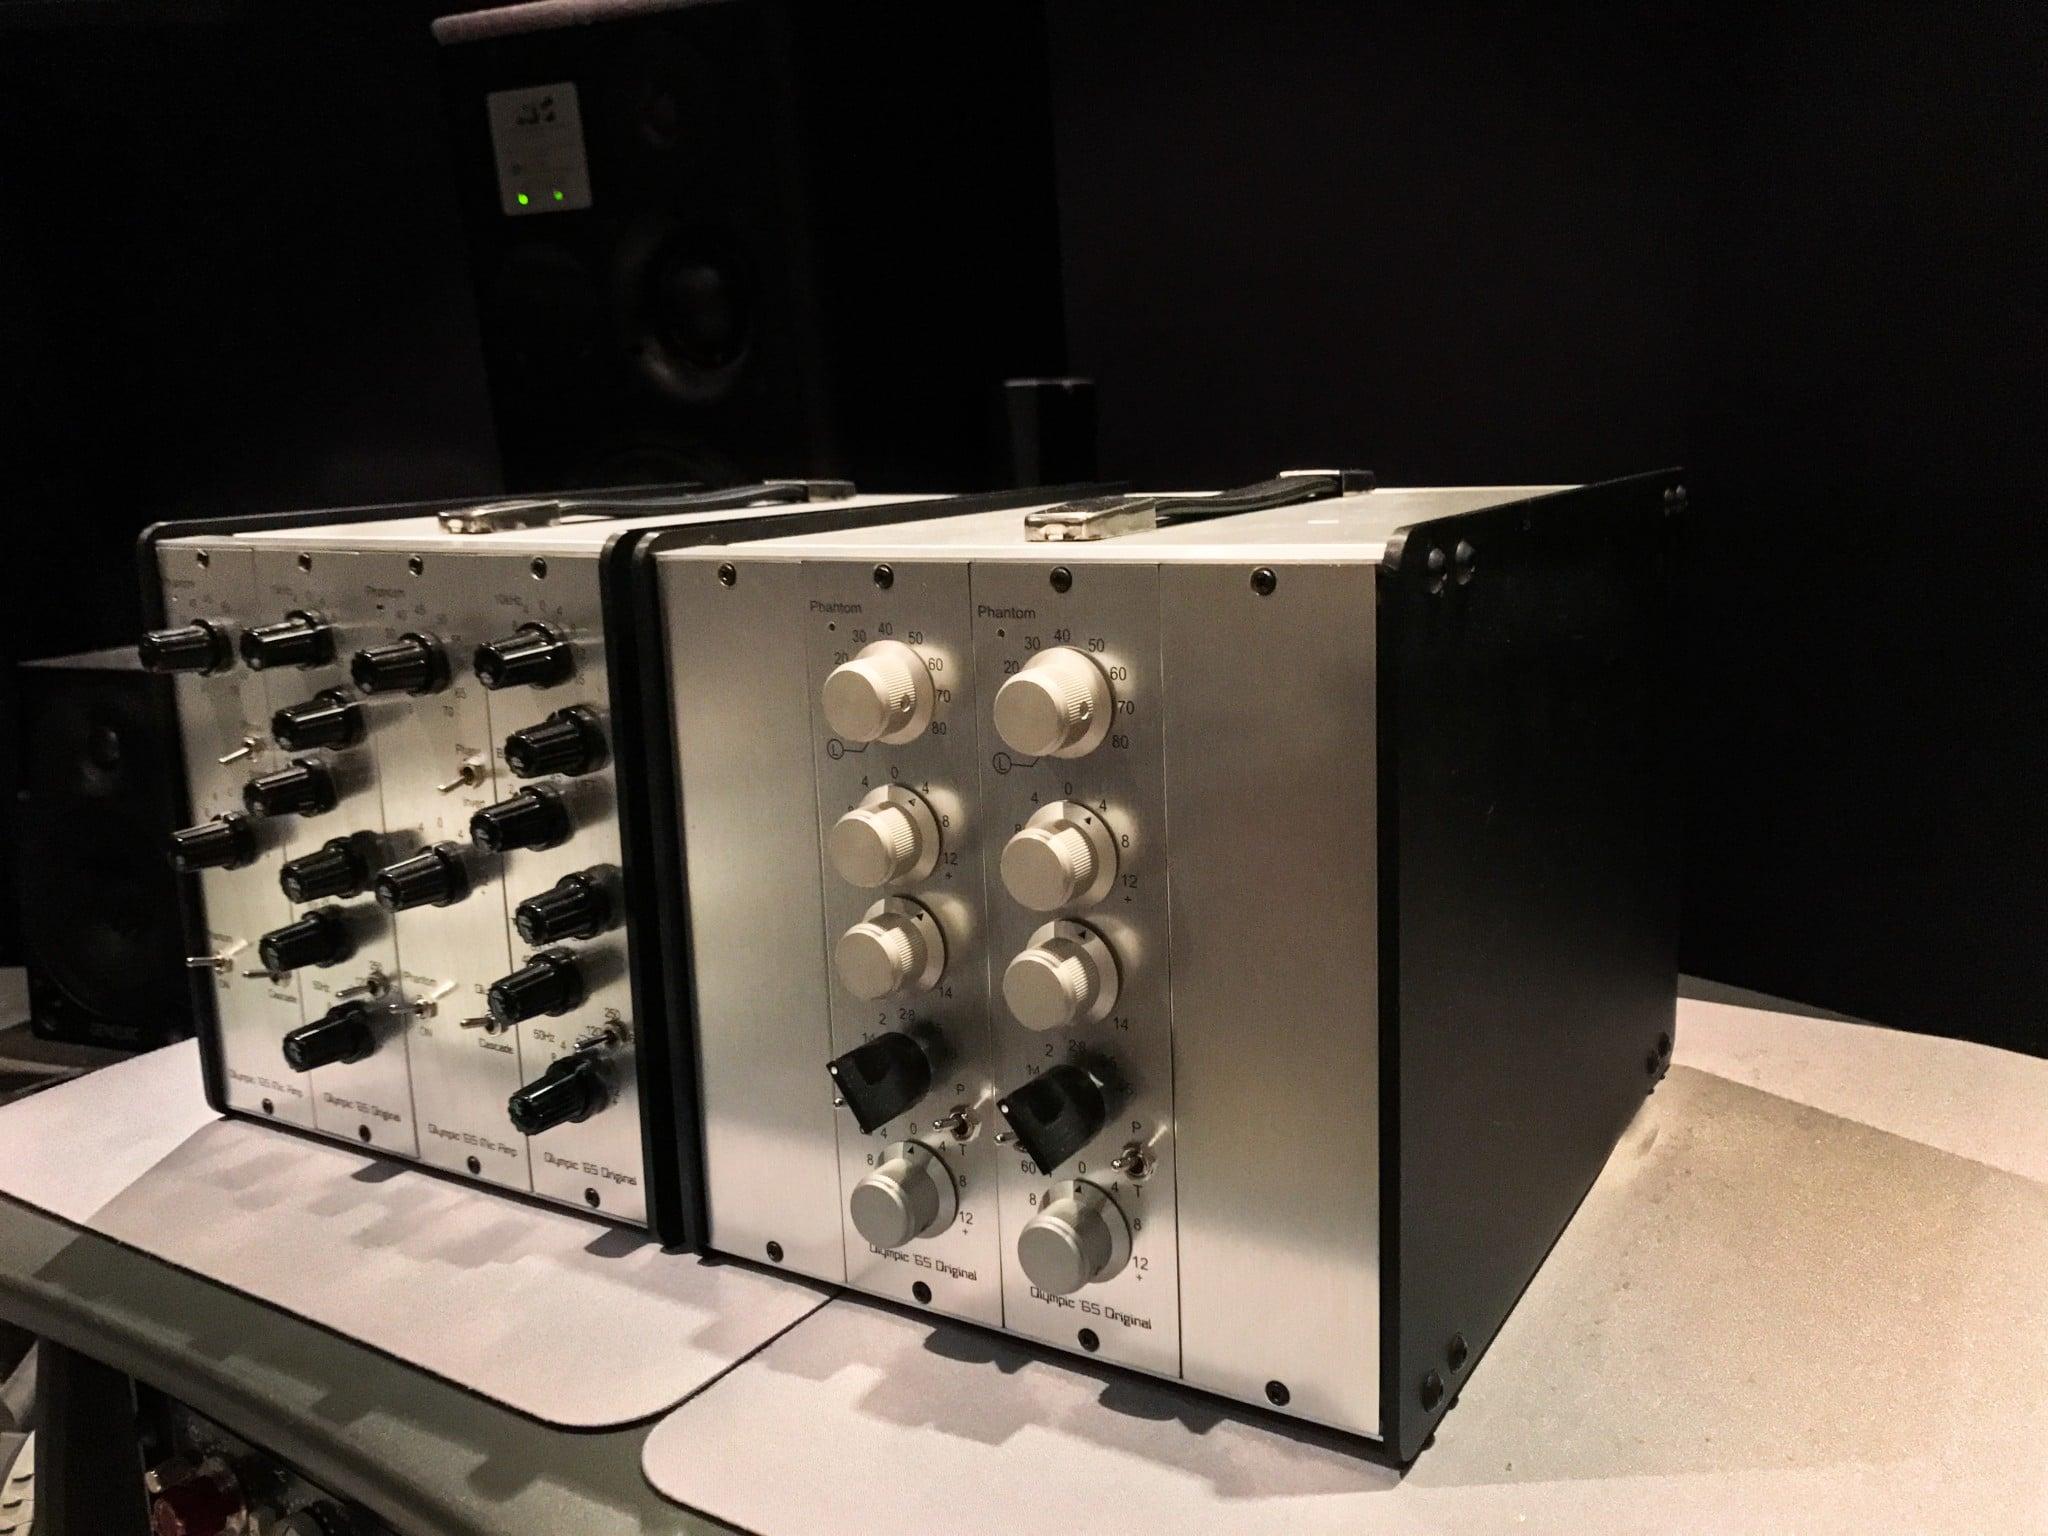 abkco-studio-olympic-studio-1-eq-3-1